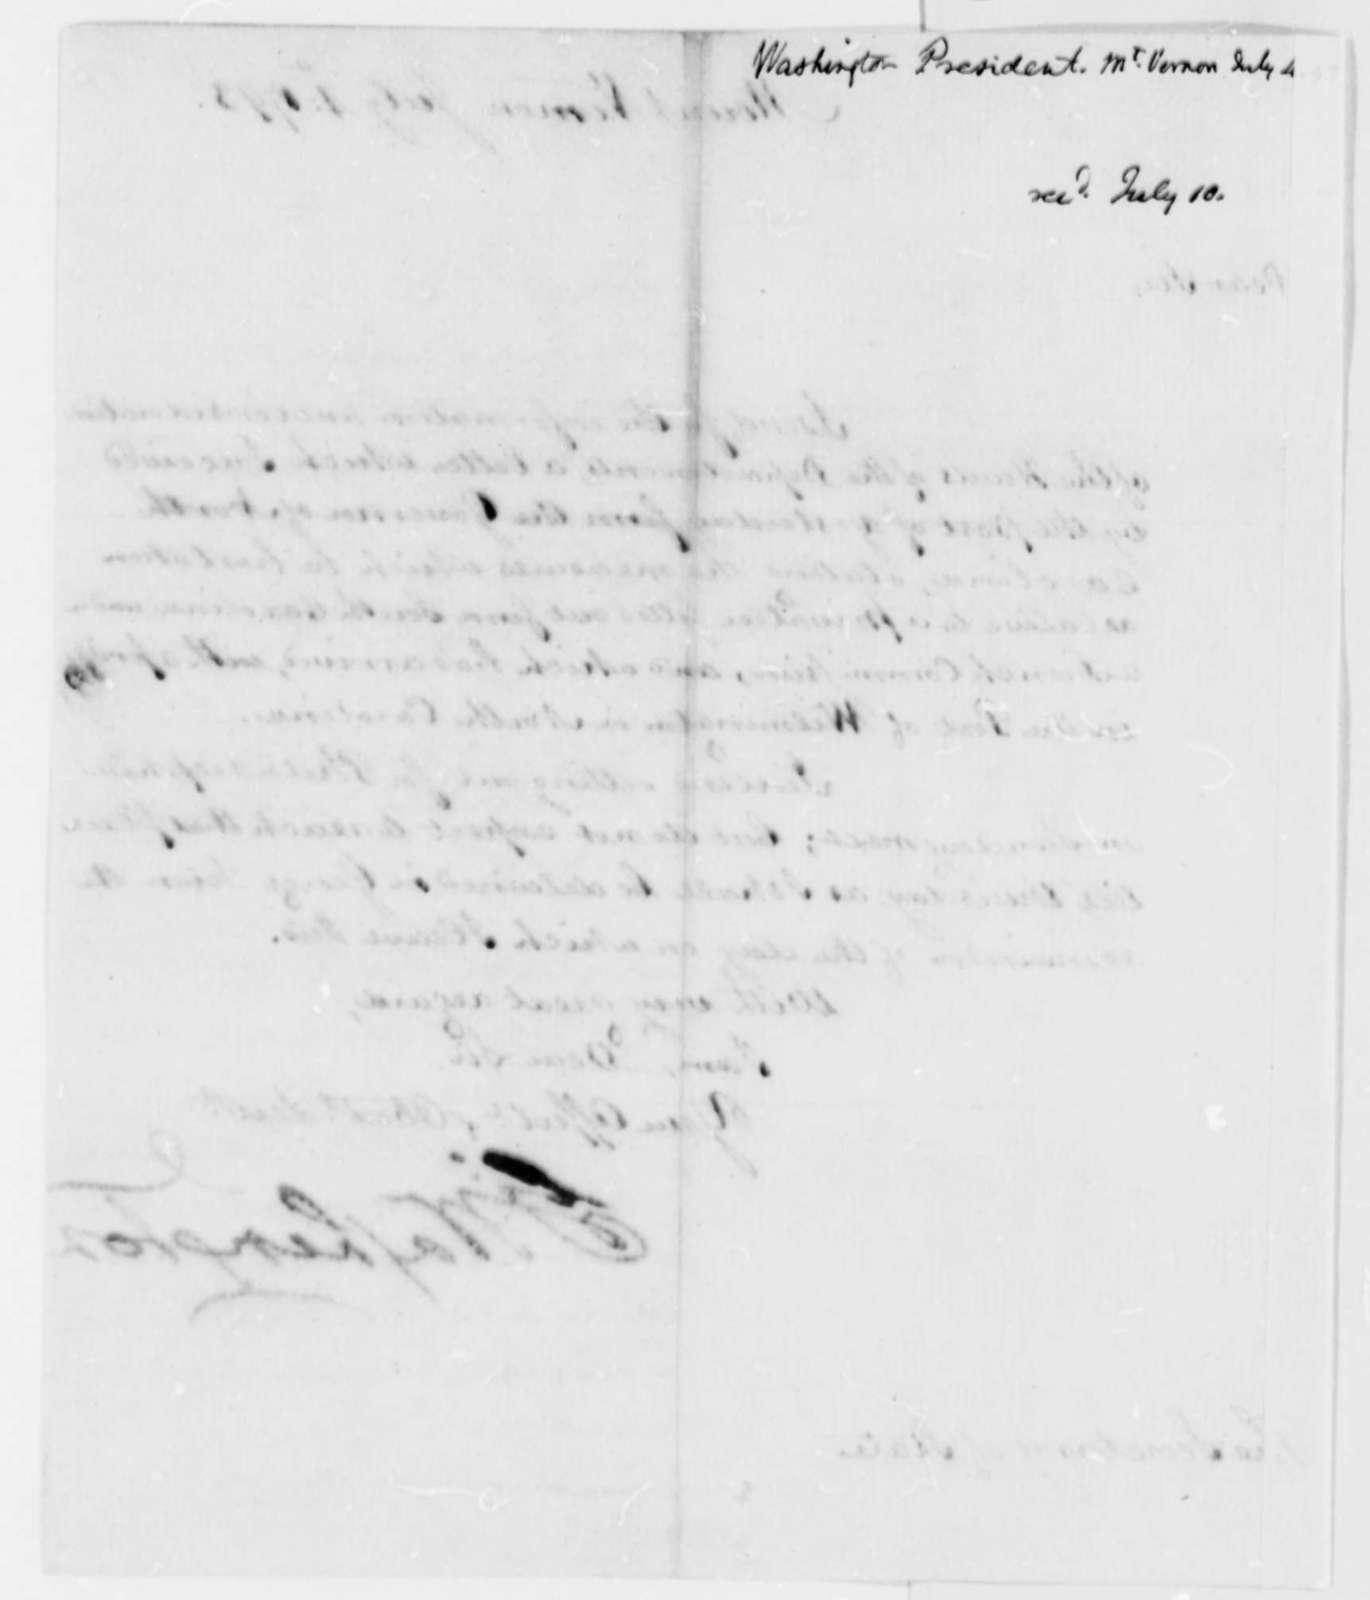 George Washington to Thomas Jefferson, July 4, 1793